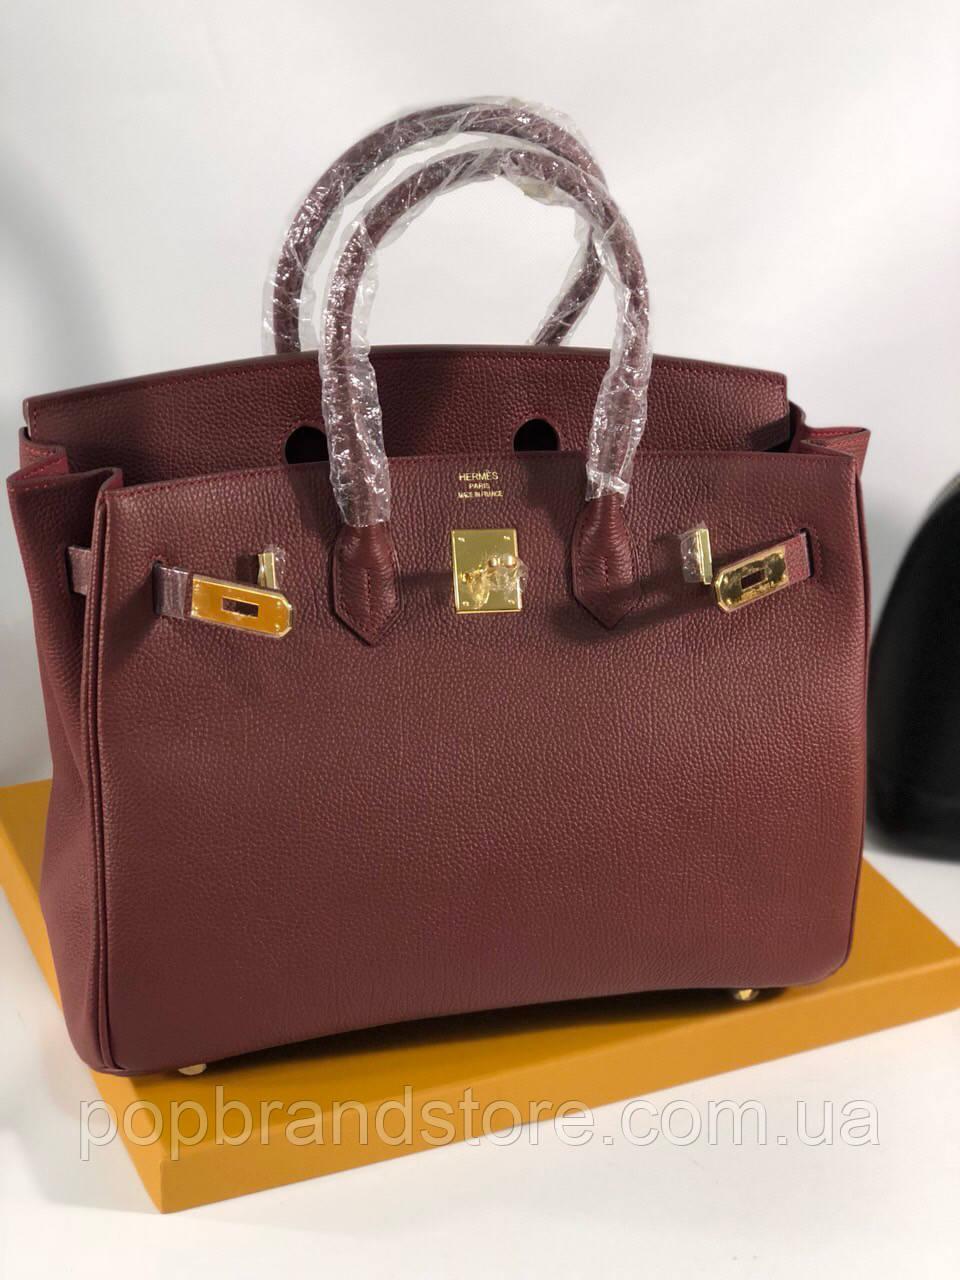 0b5c9f8d70b4 Елегантная женская сумка Гермес Биркин 35 см бордо (реплика) - Pop Brand  Store